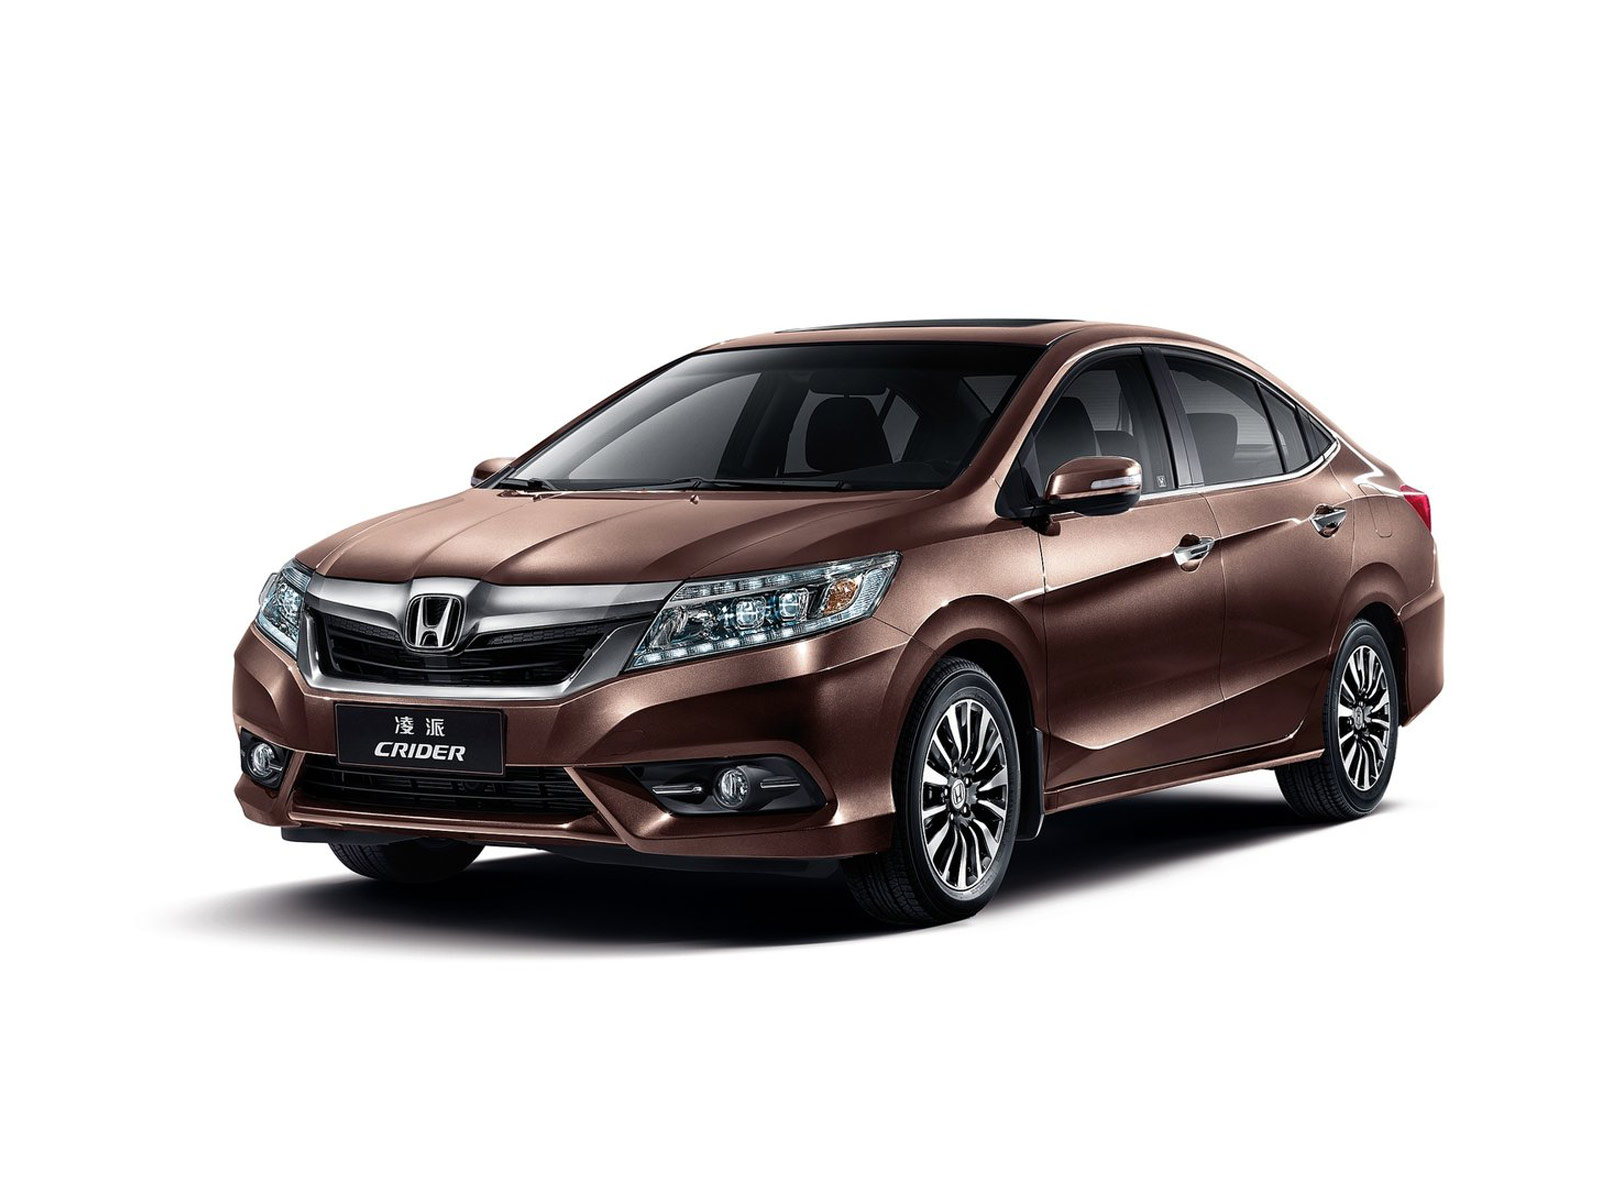 The Hartford Com >> 2014 Honda Crider Japanese car insurance information | Cars Games Today